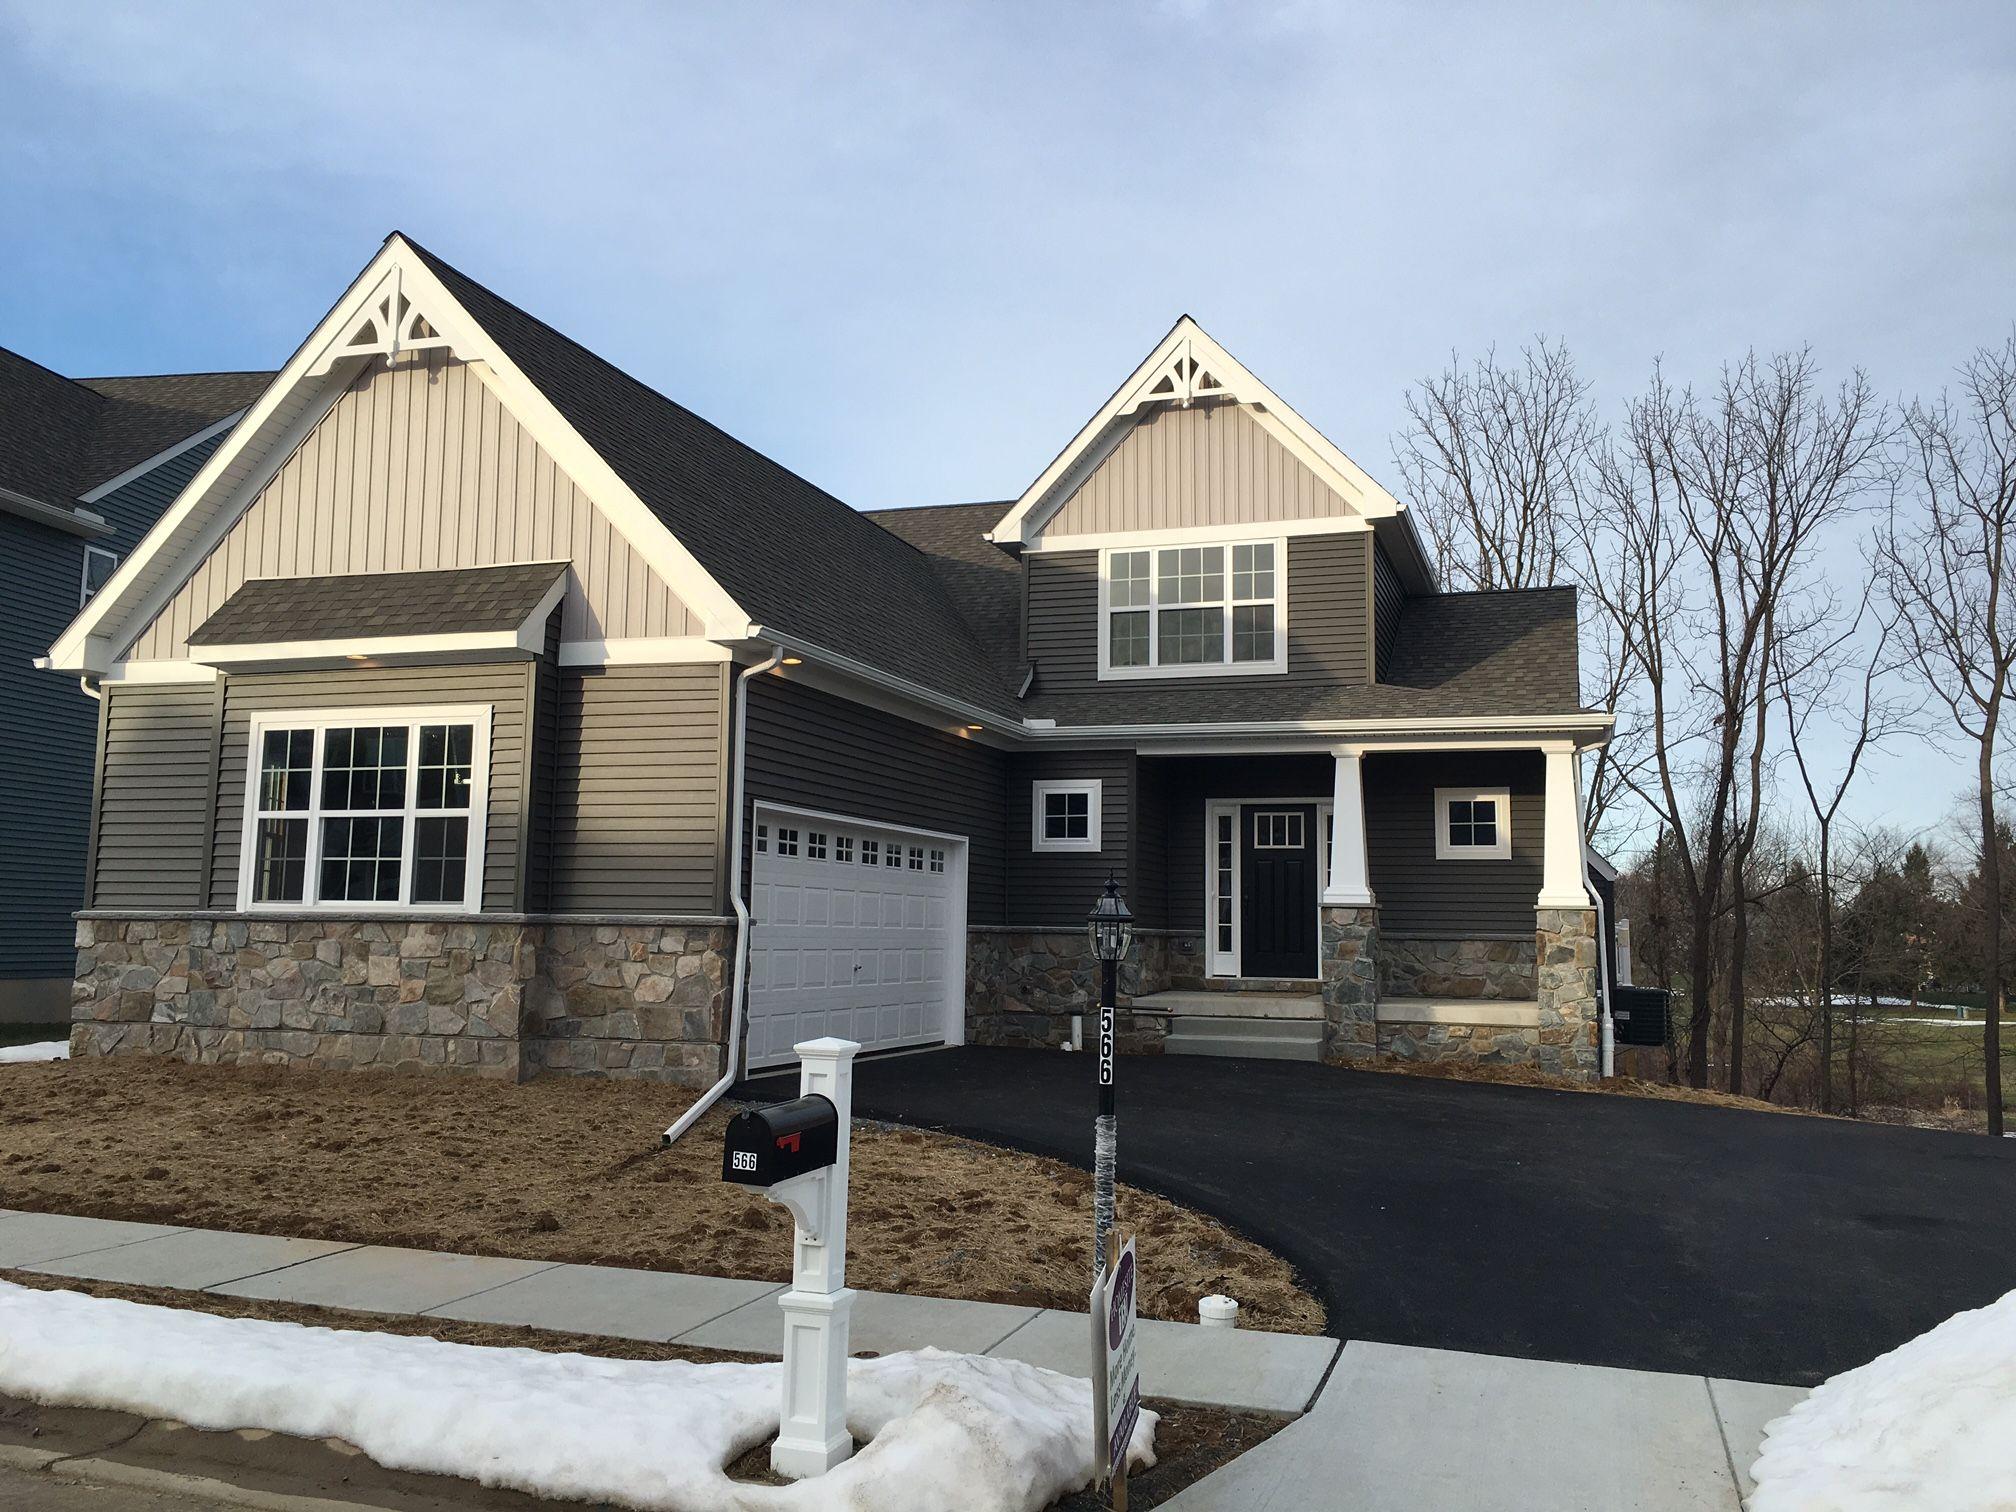 566 Royer Dr. Lancaster, Pennsylvania, Lancaster, PA Homes & Land - Real Estate